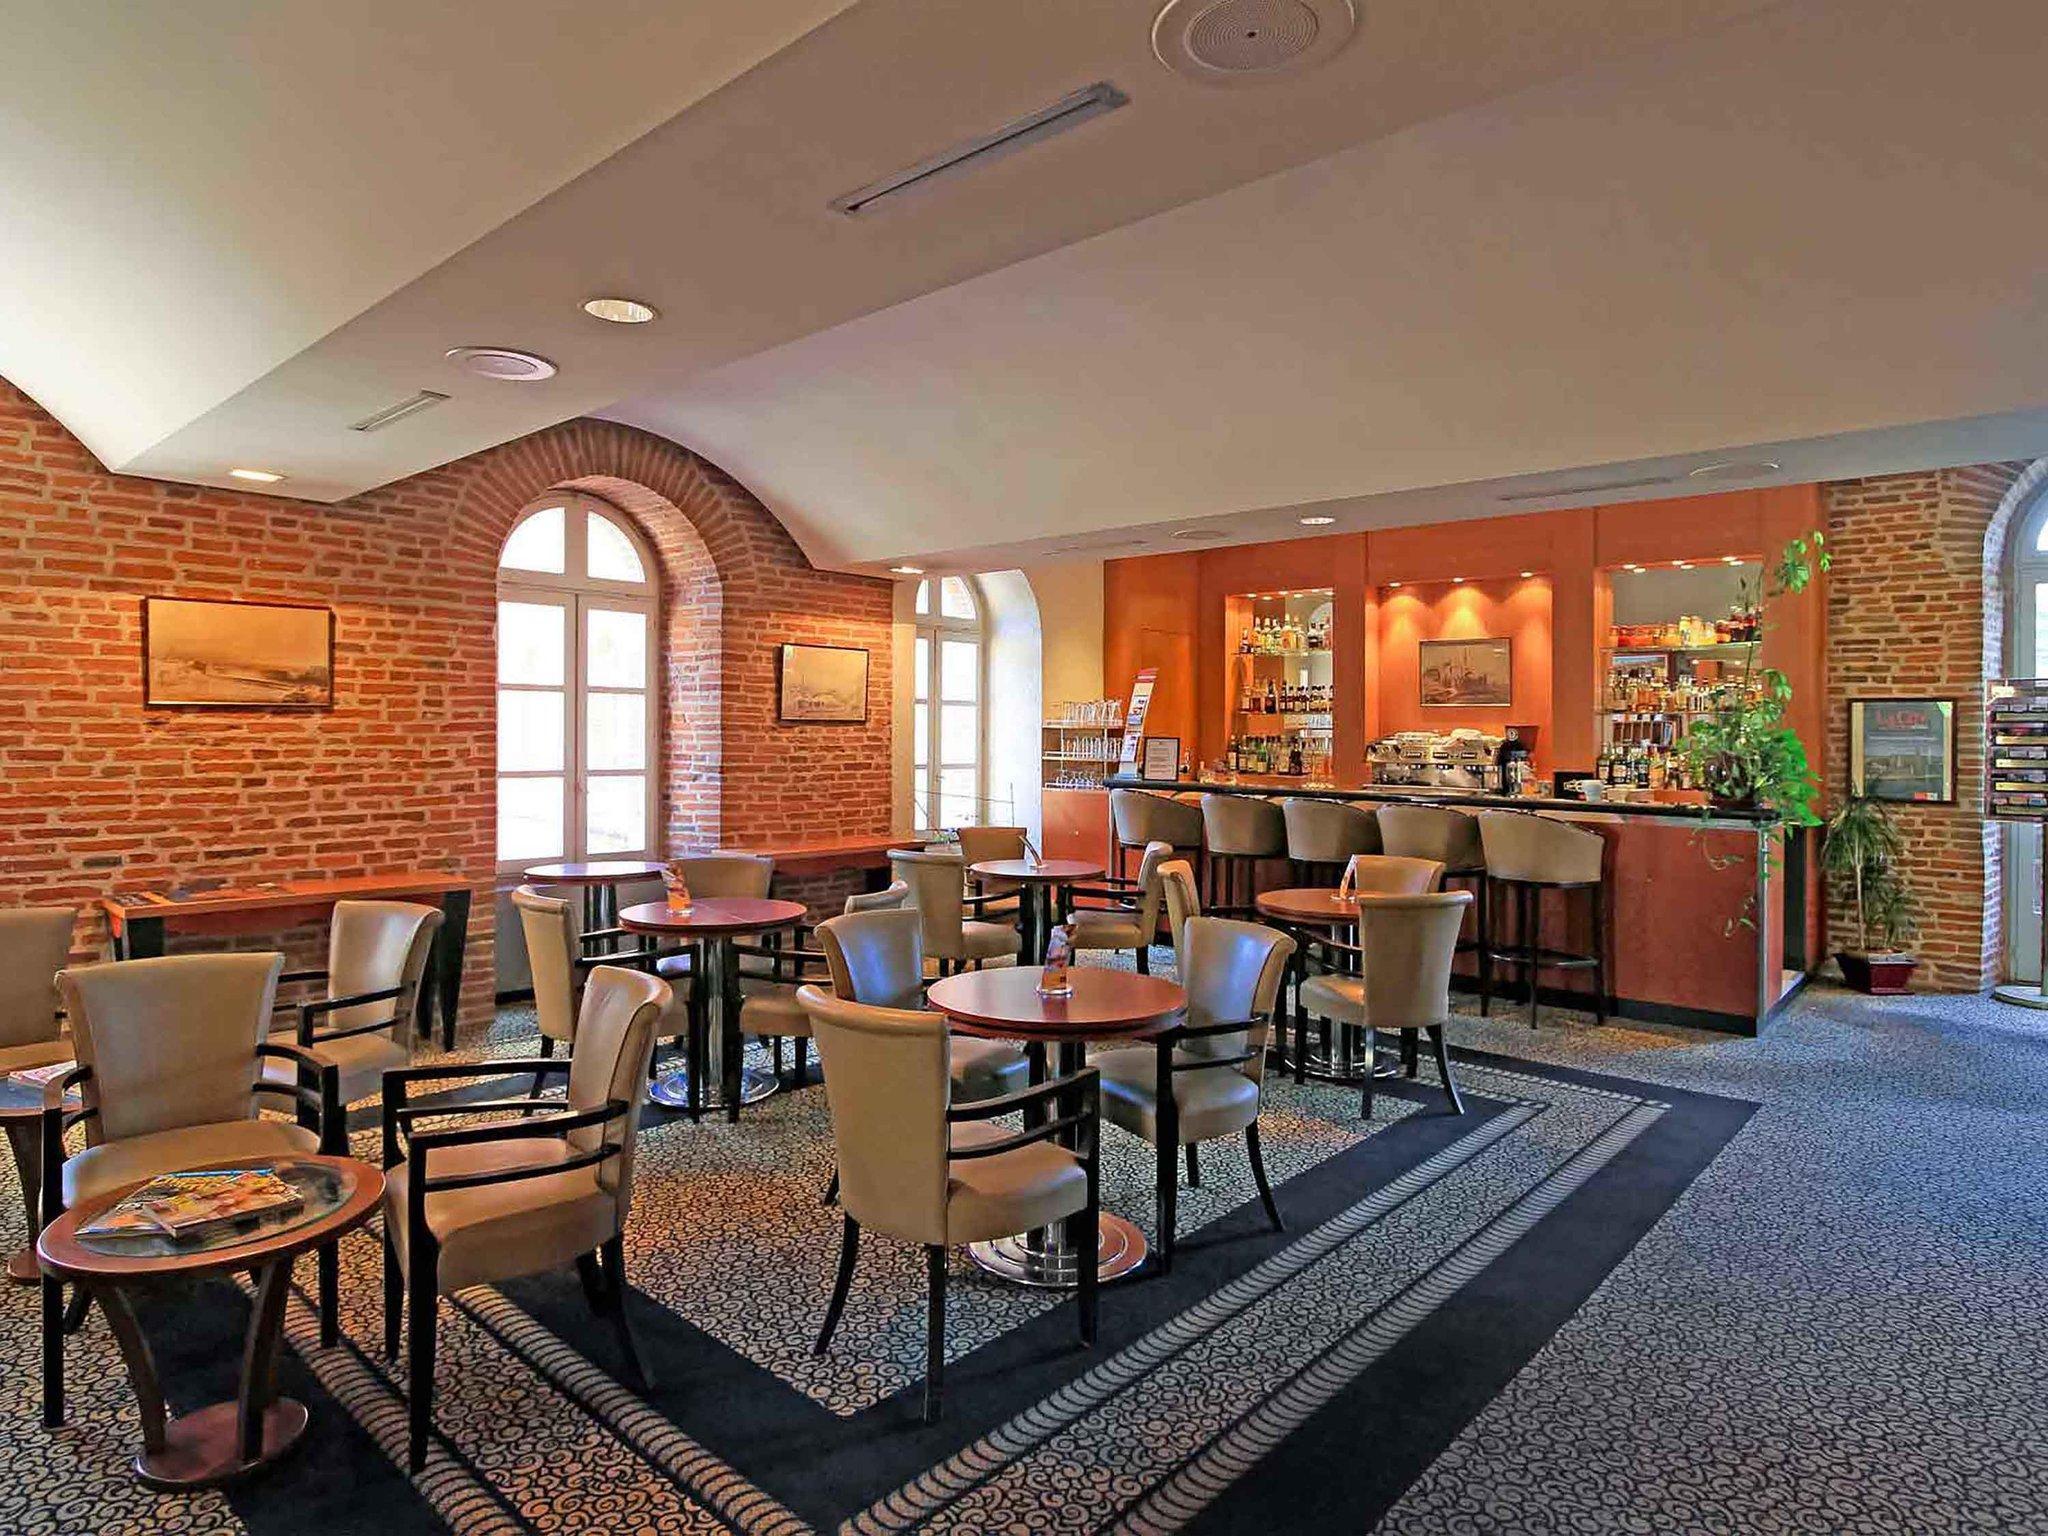 Hotel Mercure Albi Bastides